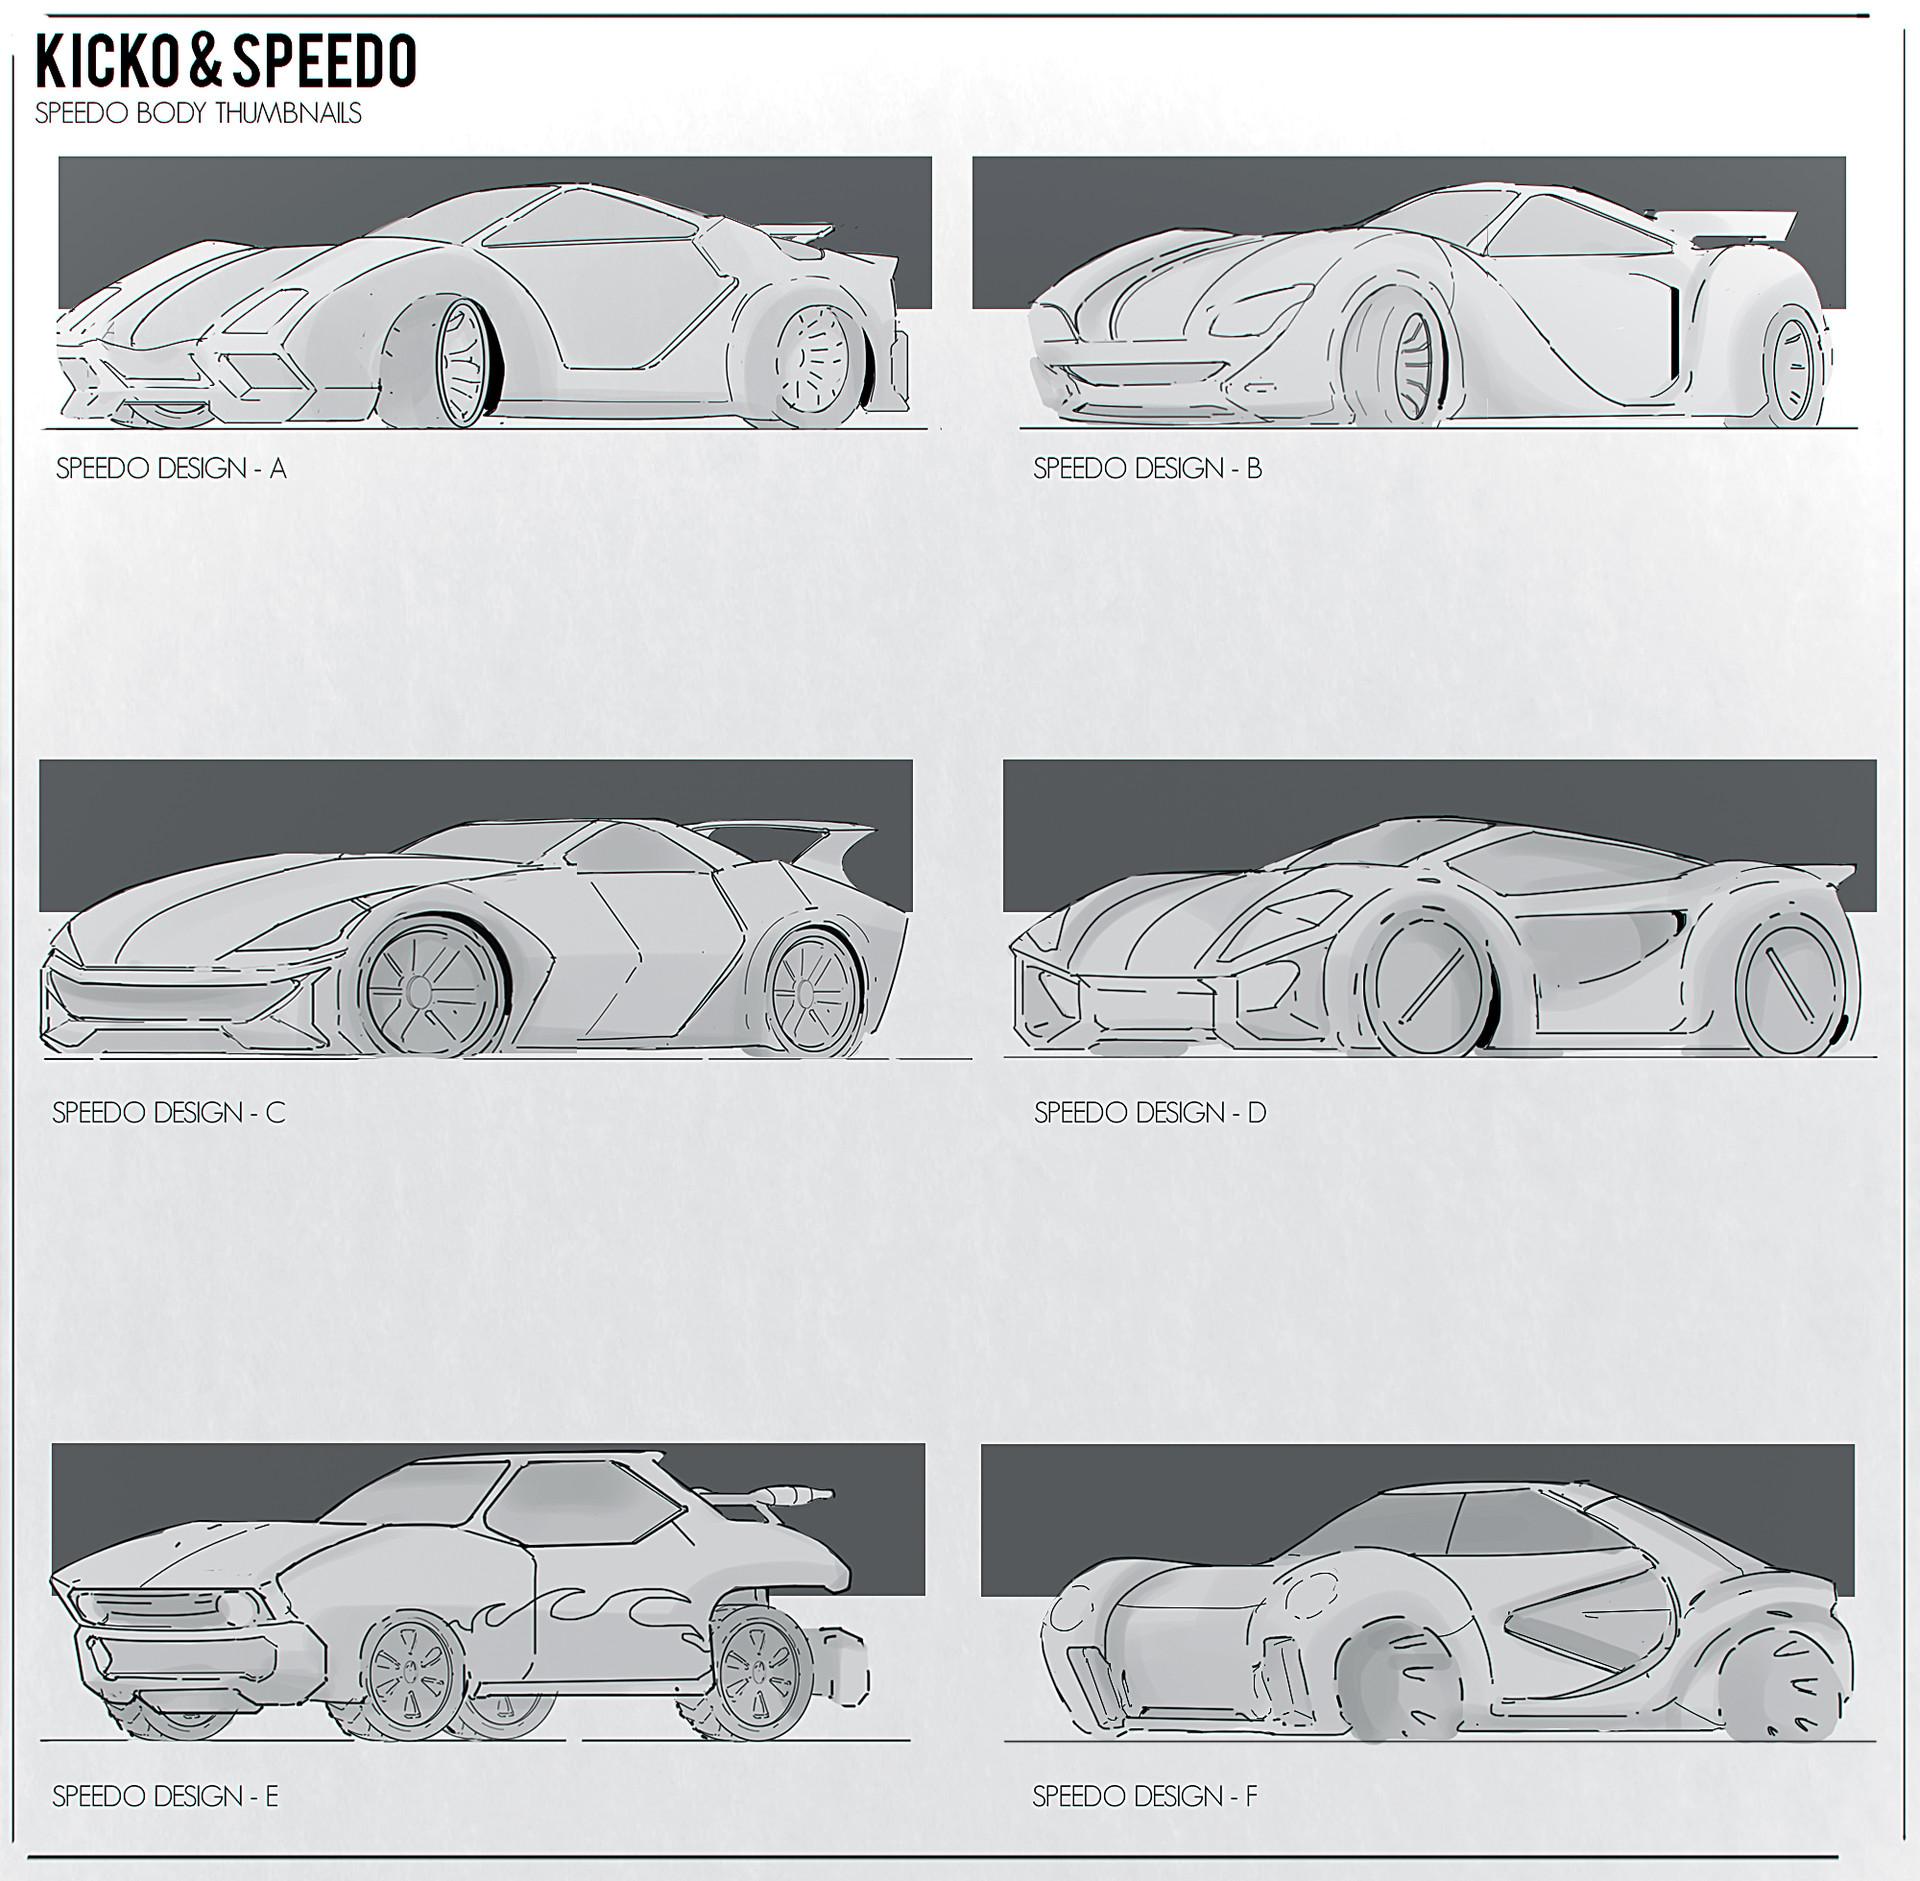 Anirudh Singh Sony Yay Super Speedo Concept Art